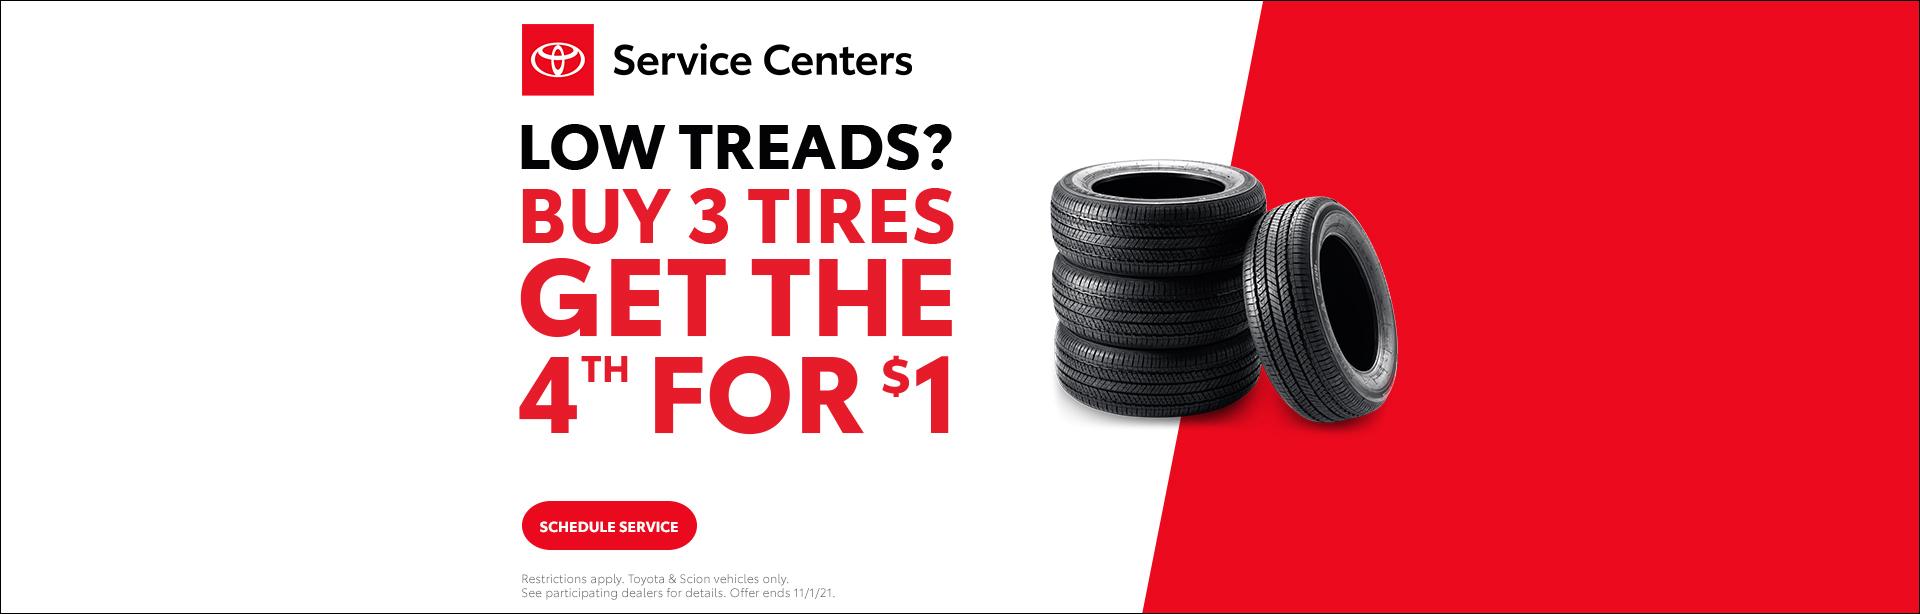 10-21_01_Cincinnati-September-2021-NAT-Buy-3-Tires---CIN_1920x614_73b1_All-Models_R_xta.jpeg